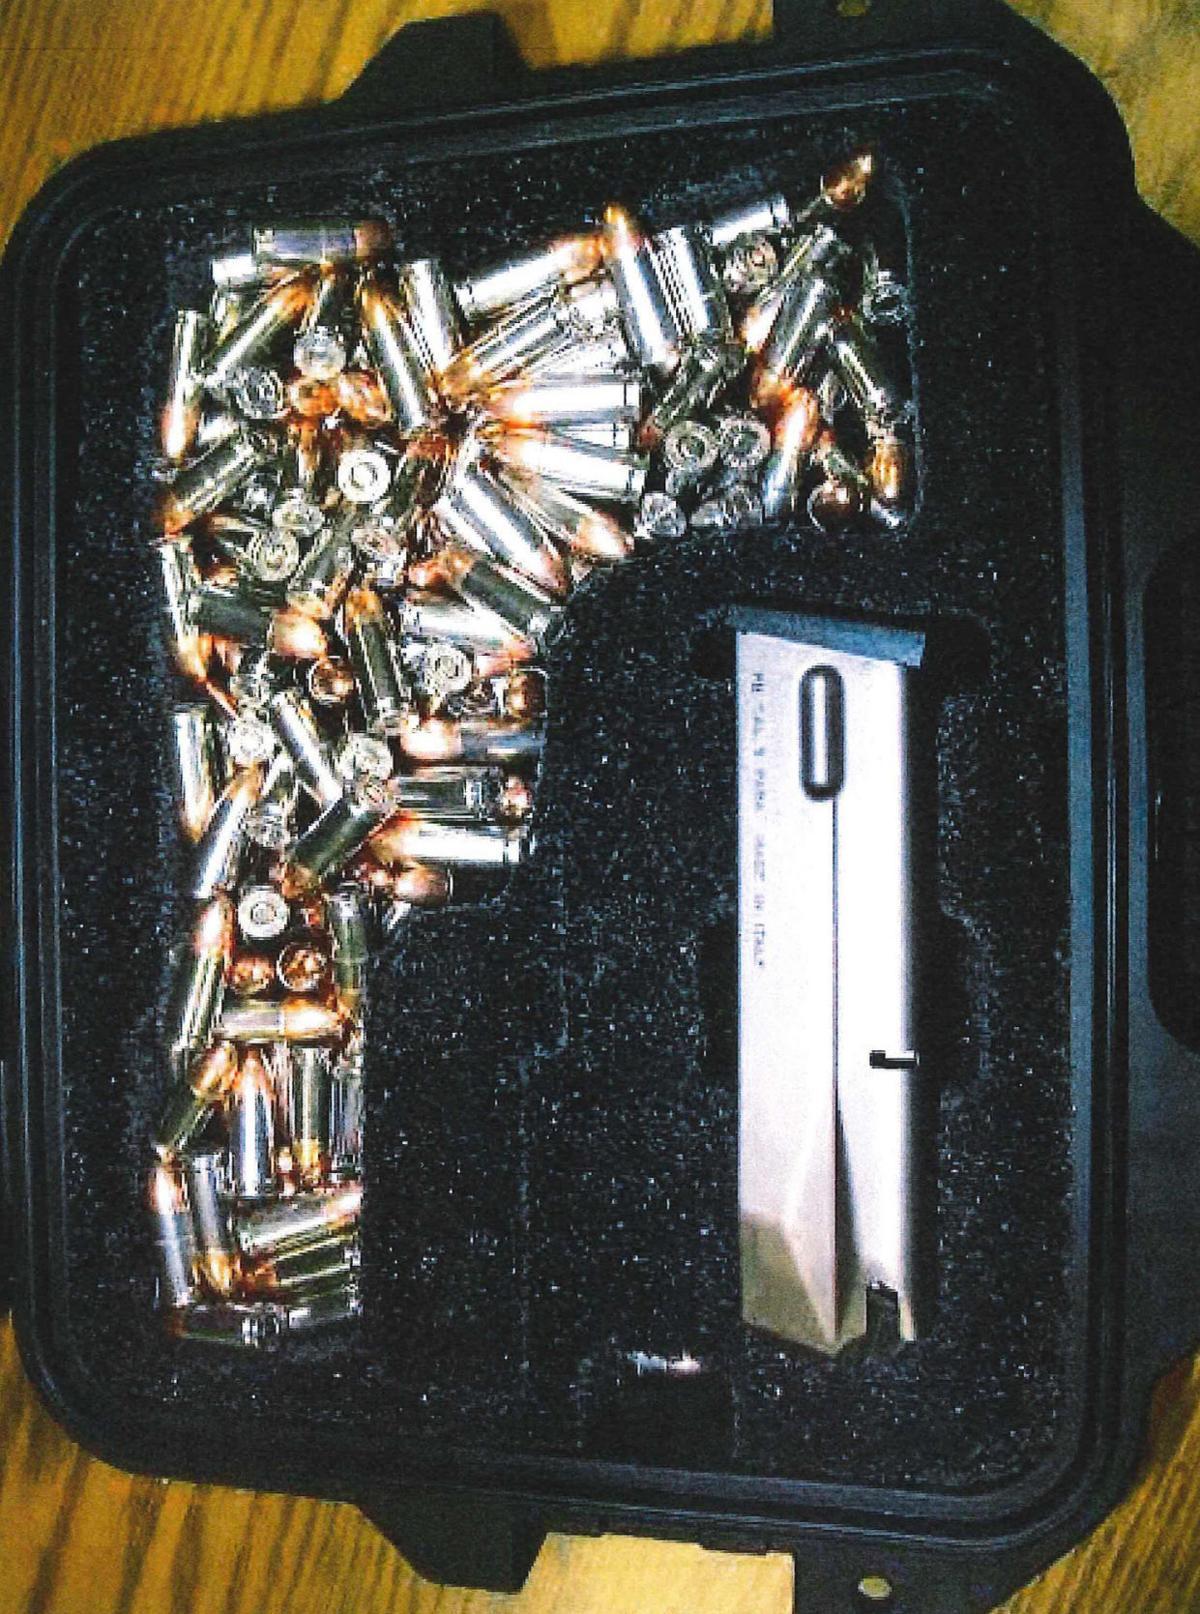 Smuggling case